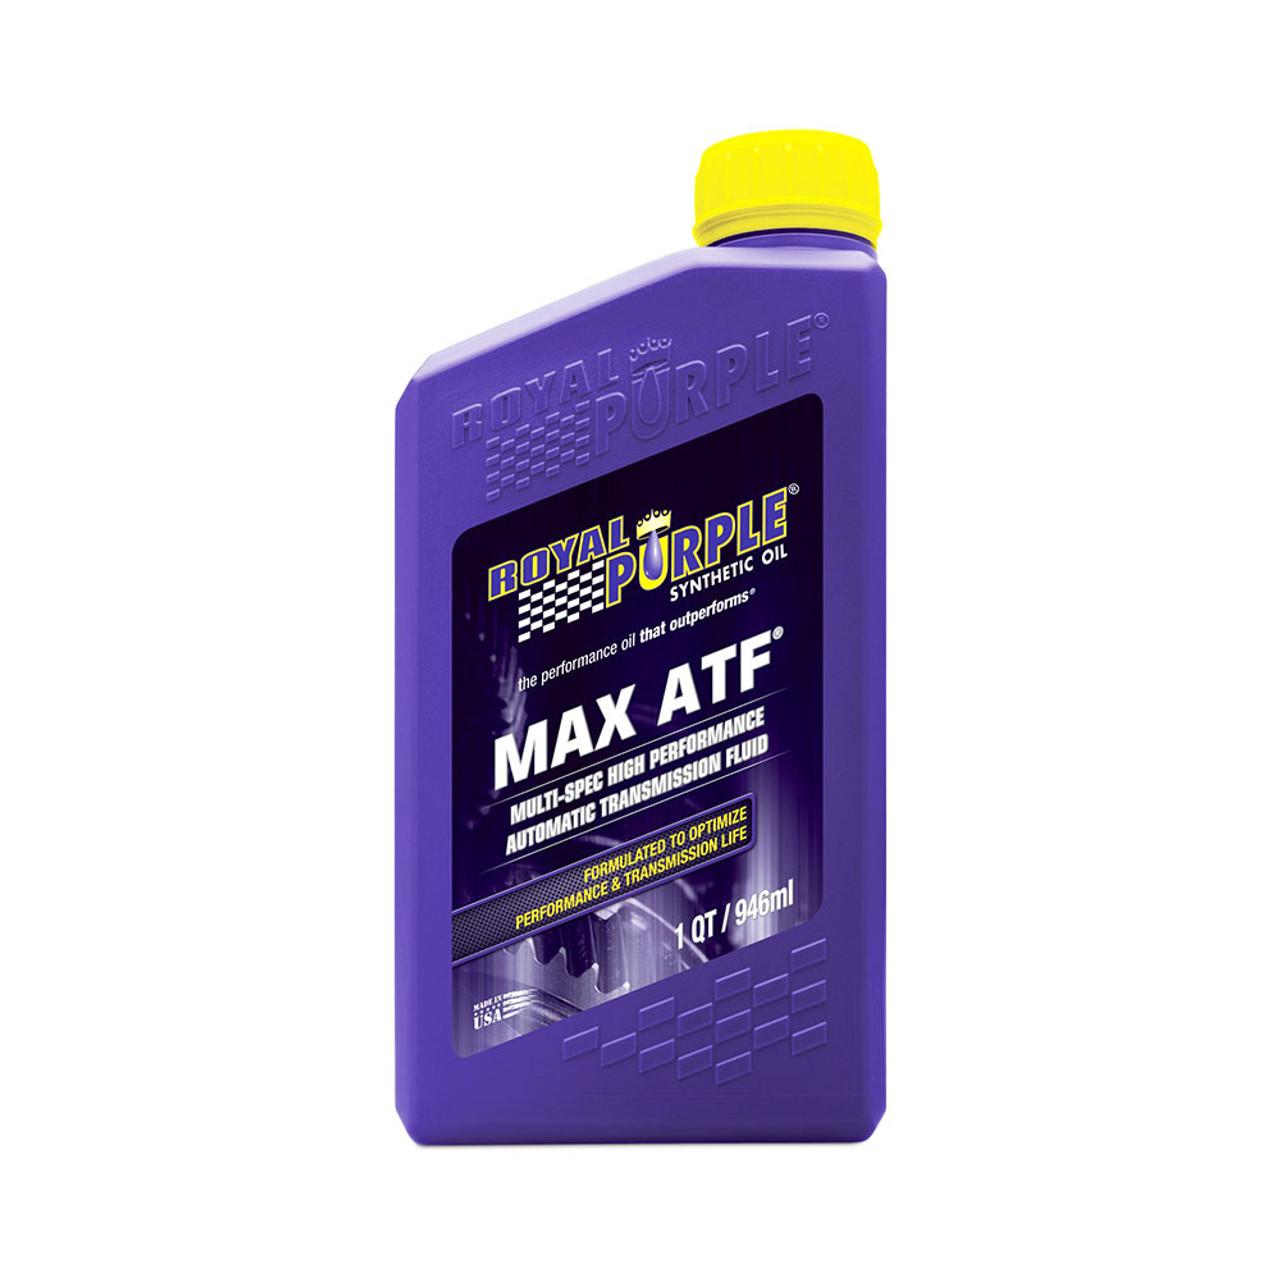 ROYAL PURPLE (01320) MAX ATF, AUTOMATIC TRANSMISSION FLUID (QUART)